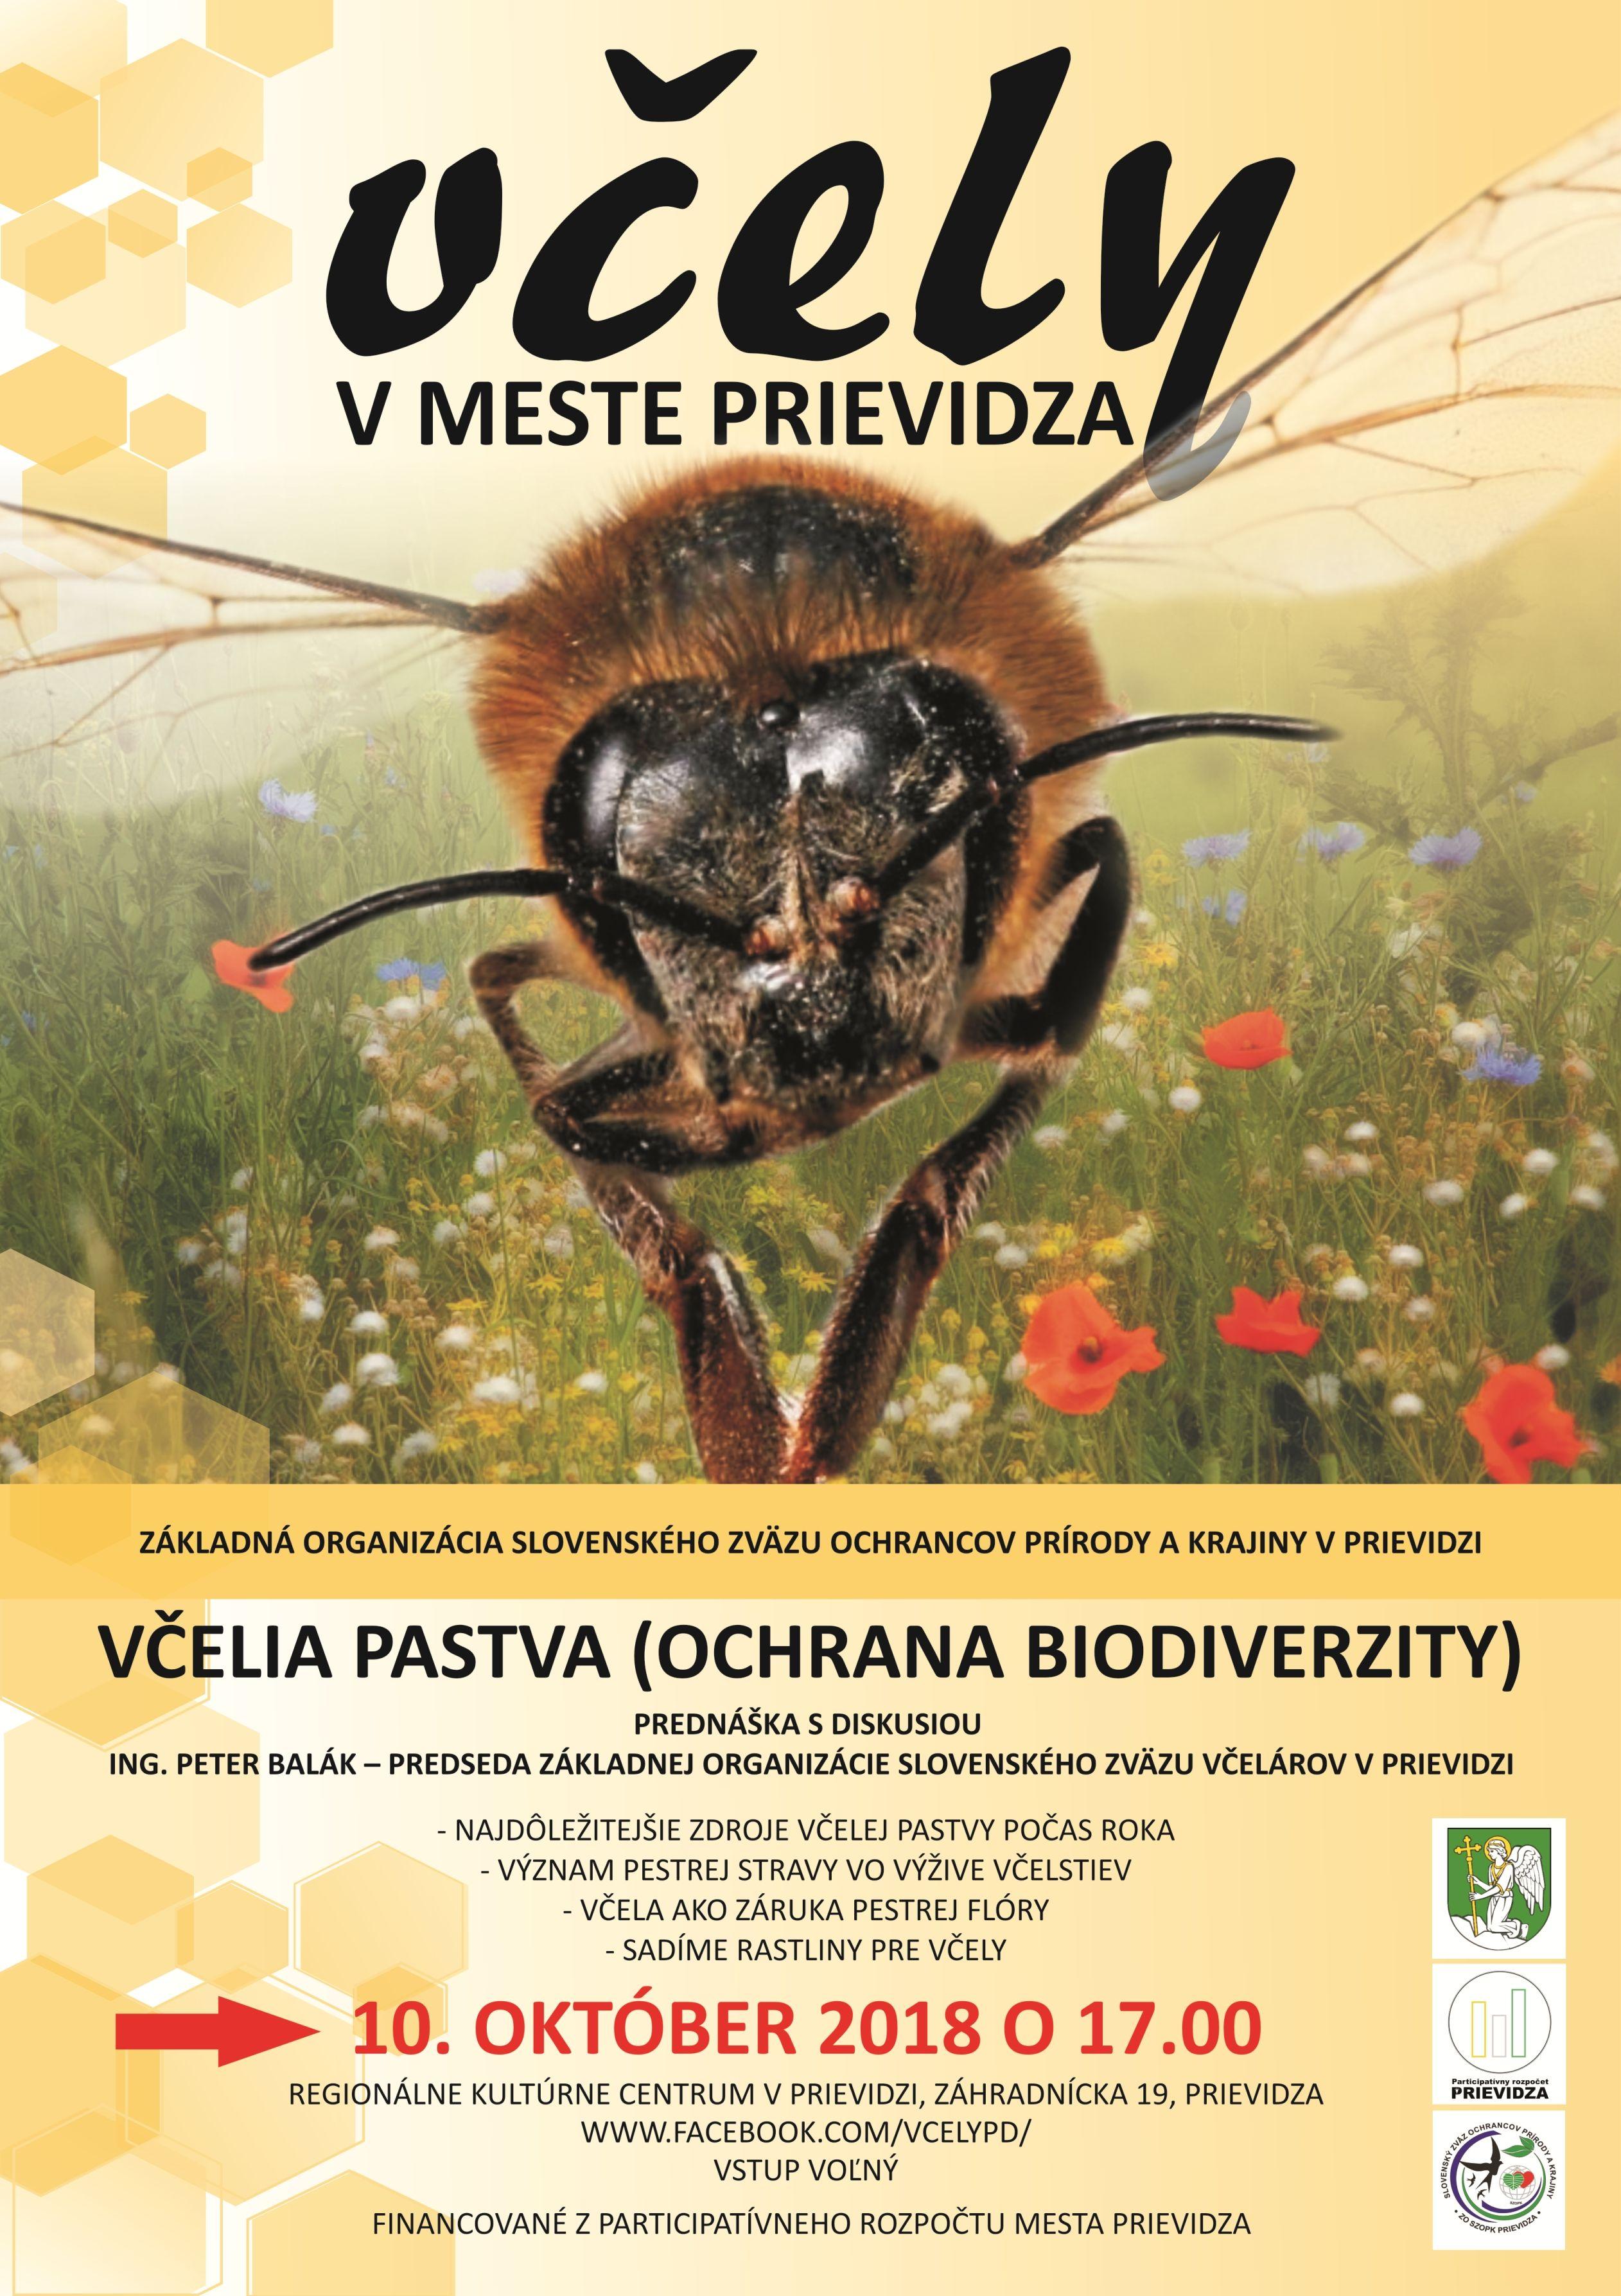 Včelia pastva (ochrana biodiverzity)